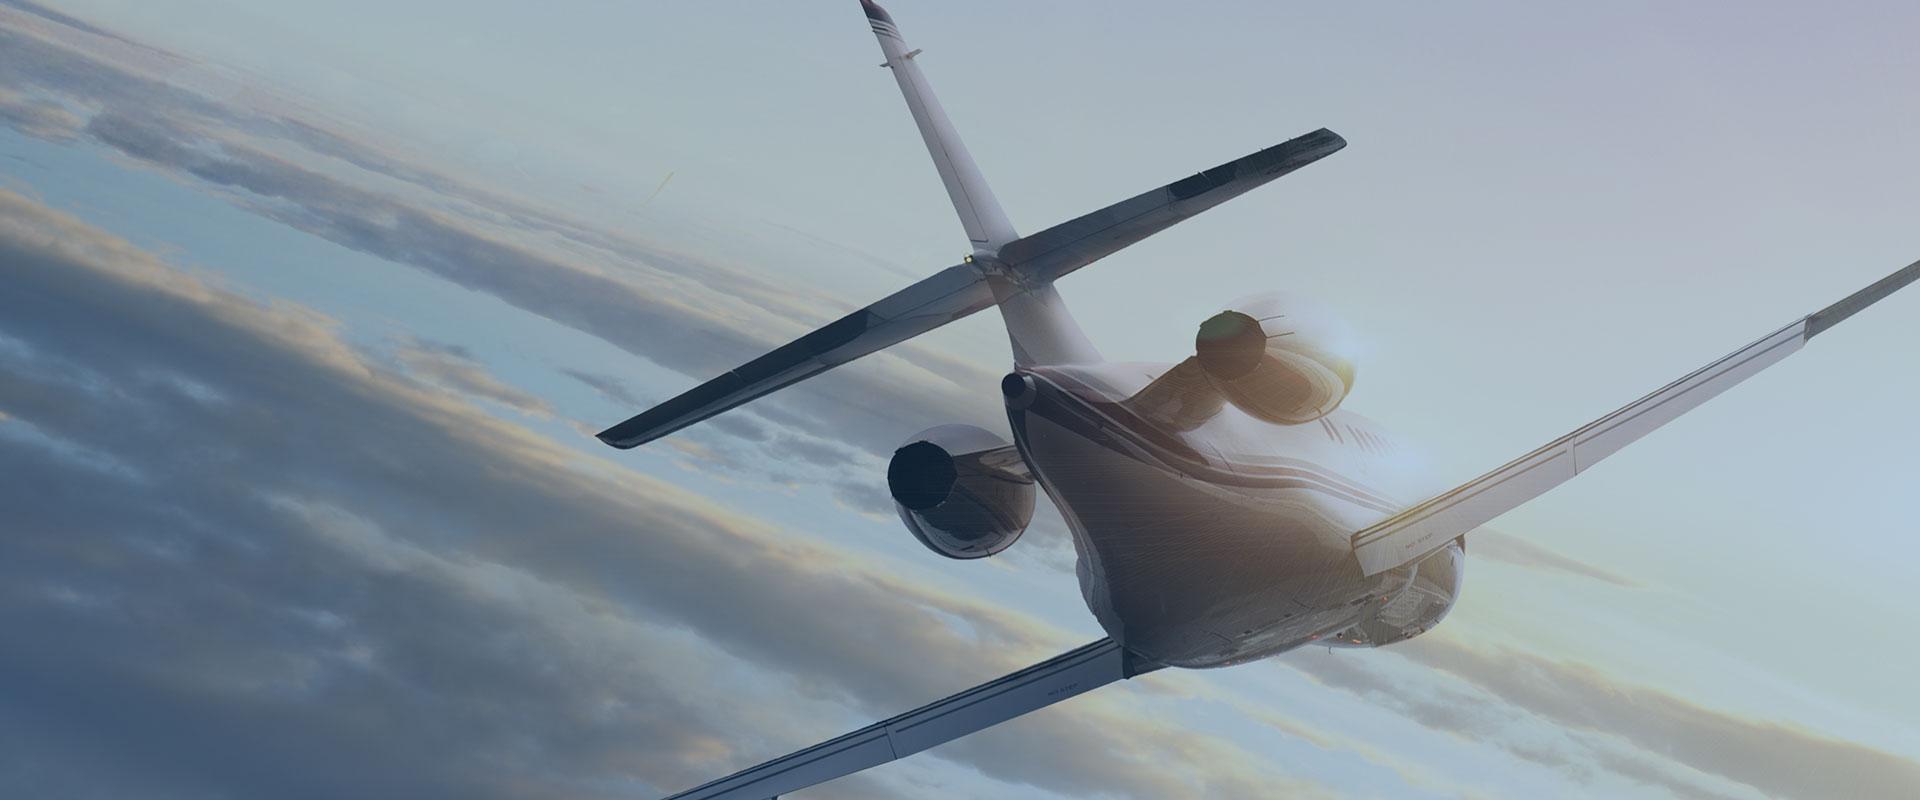 Capa banner-01.jpg - Seguro Aeronáutico